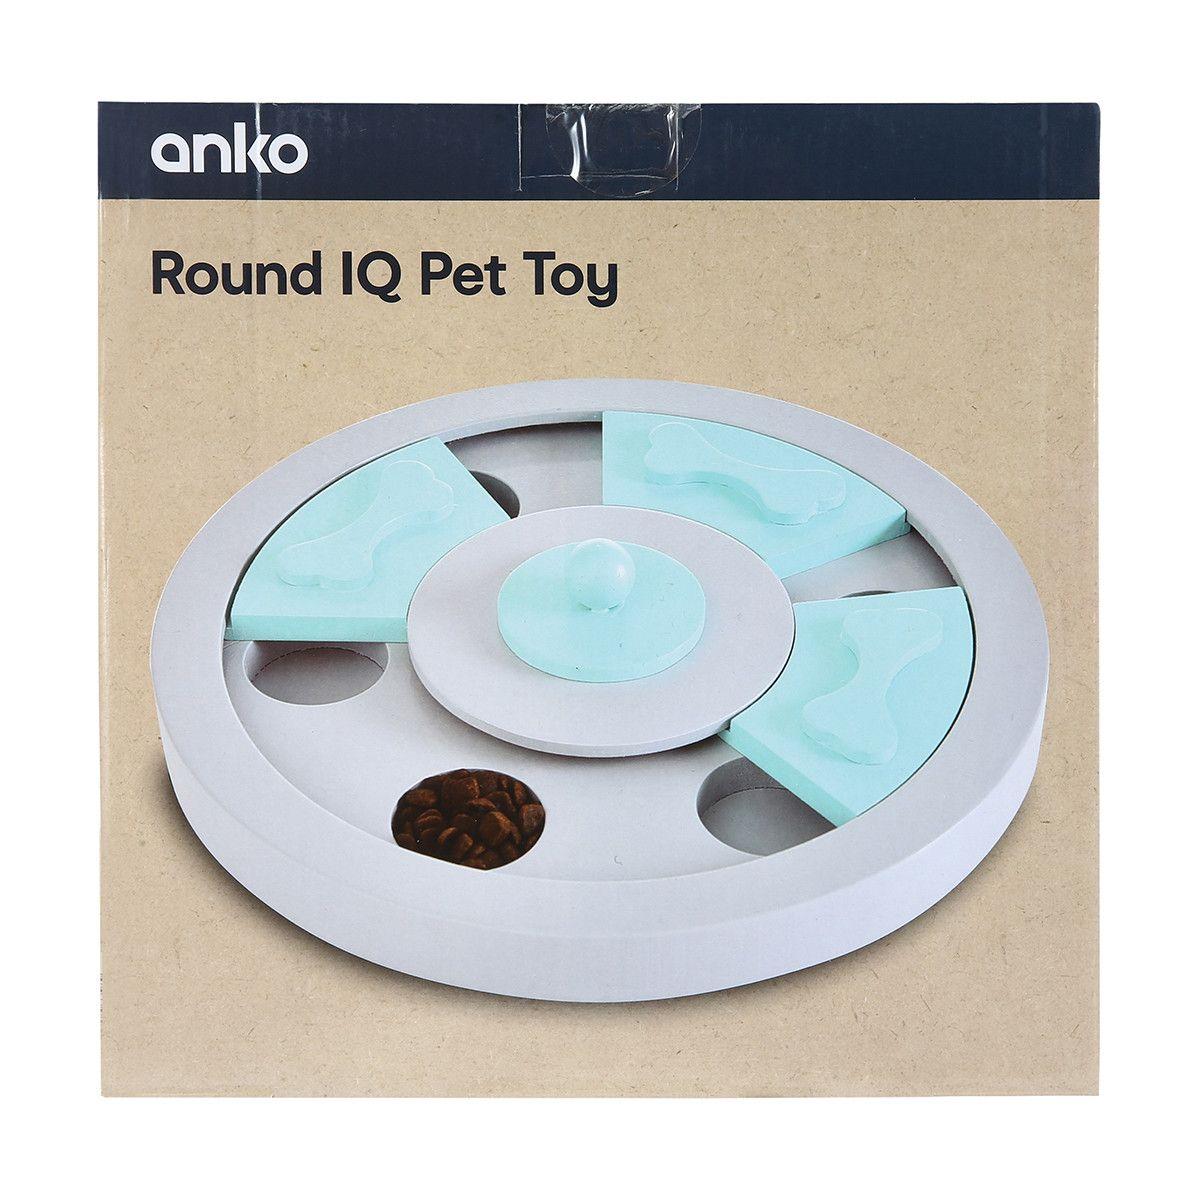 Round Iq Pet Toy Kmart Pet Toys Gotcha Day Pets